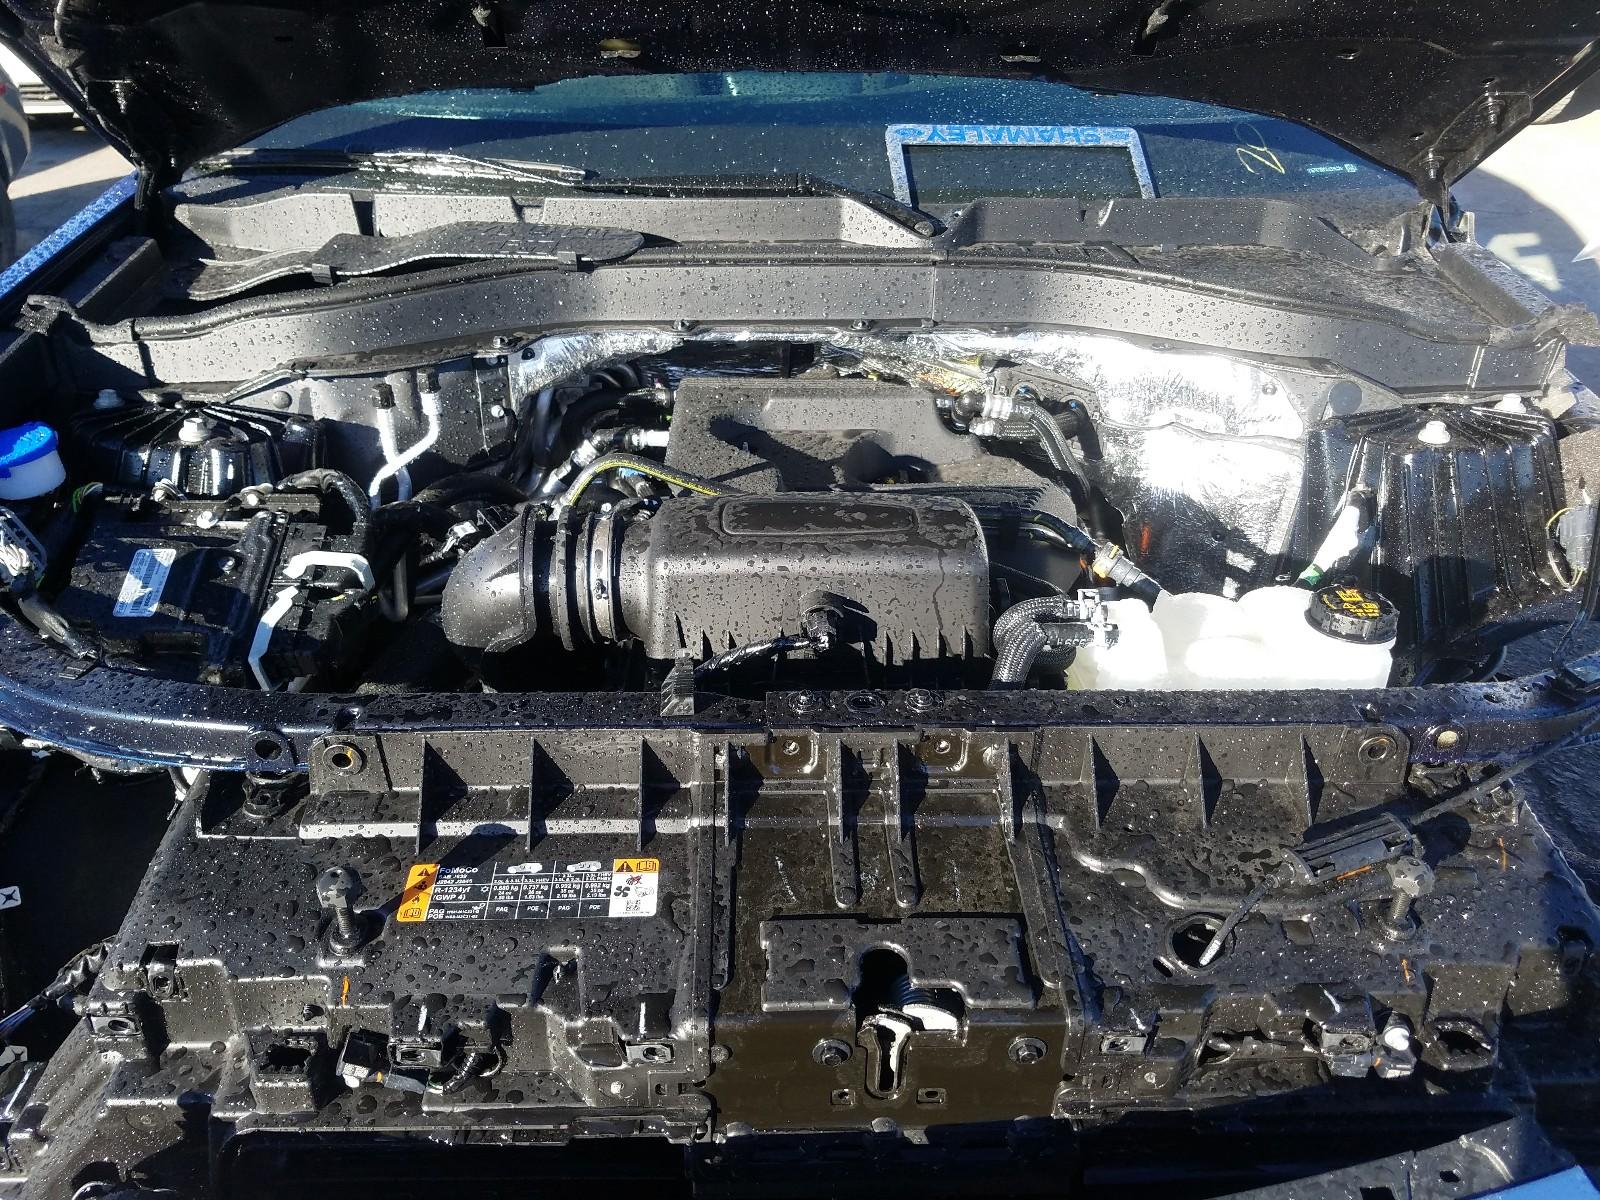 1FMSK7DH1LGB15824 - 2020 Ford Explorer X 2.3L inside view